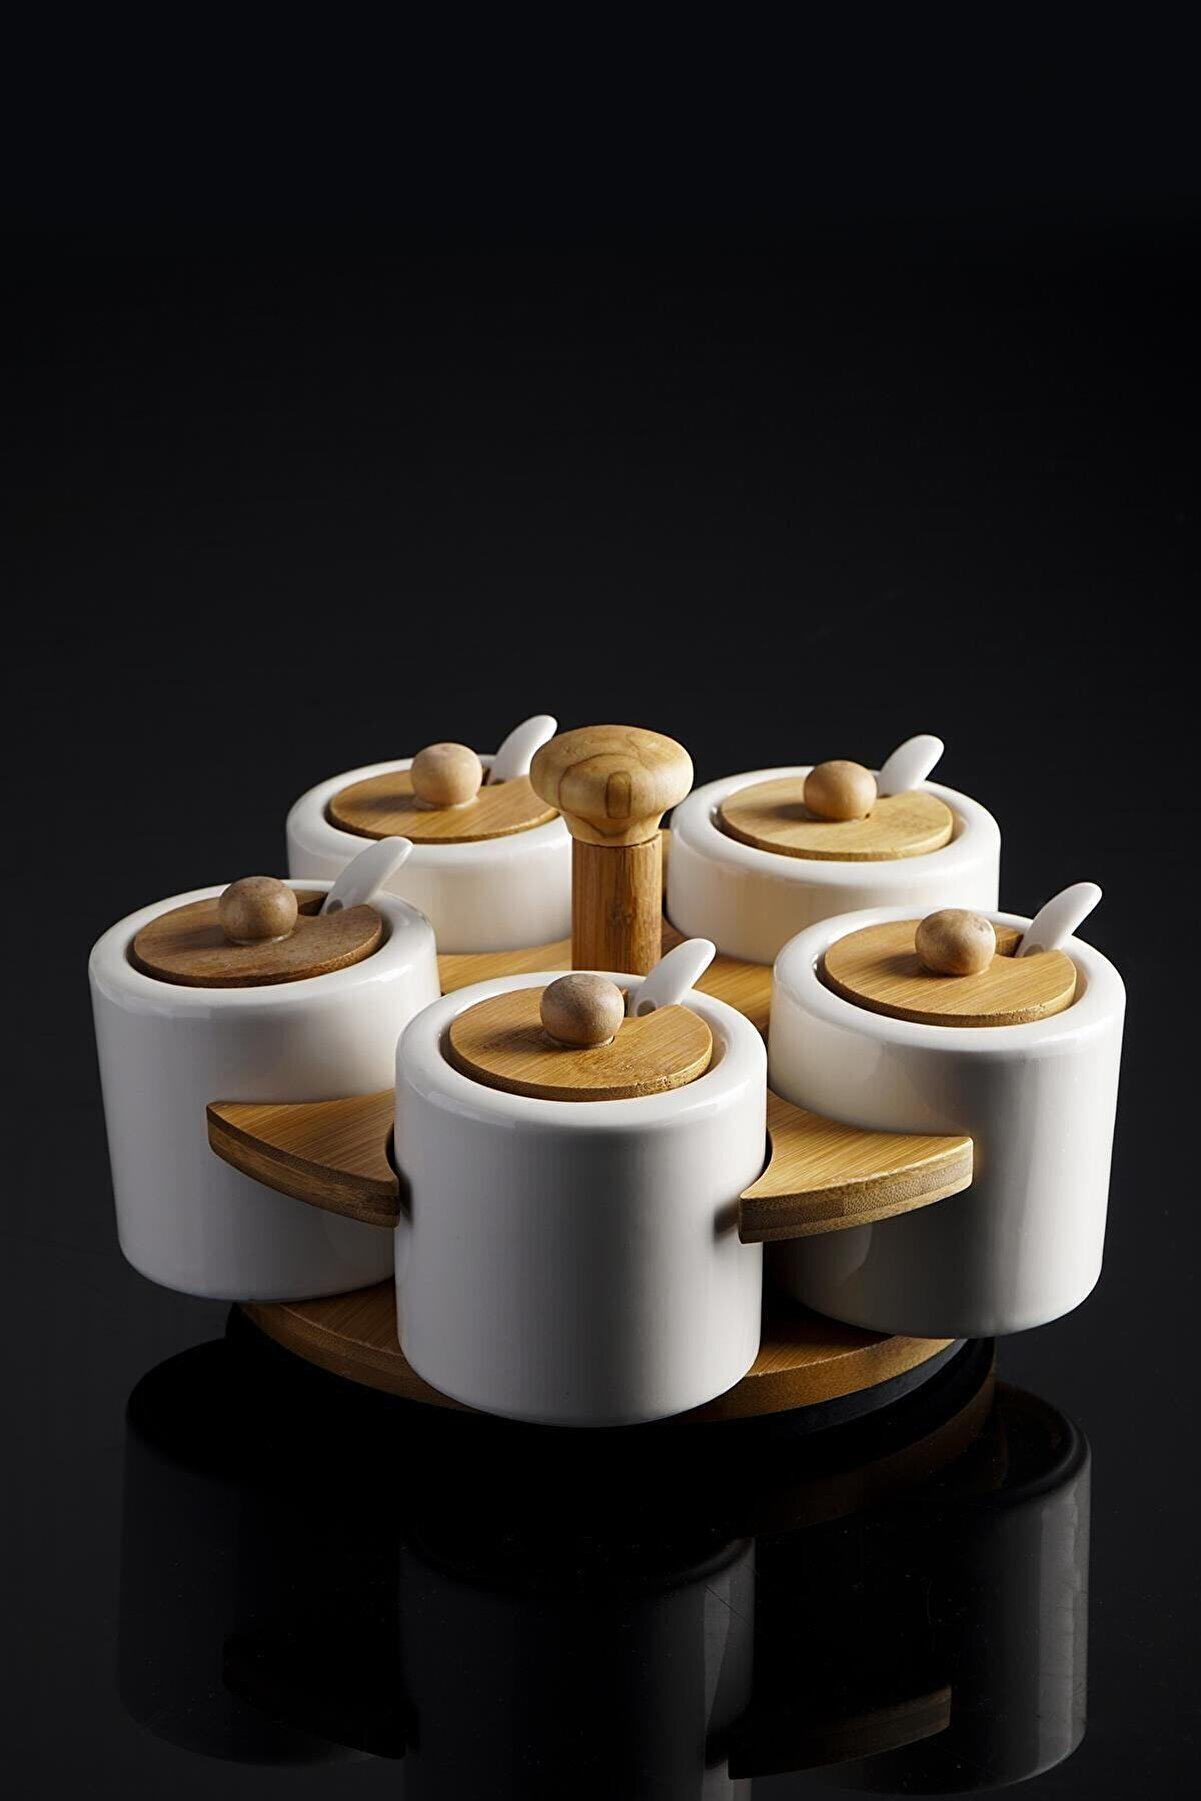 ACAR La Pure 5'li Dönerli Bambu Standlı Yuvarlak Porselen Baharatlık